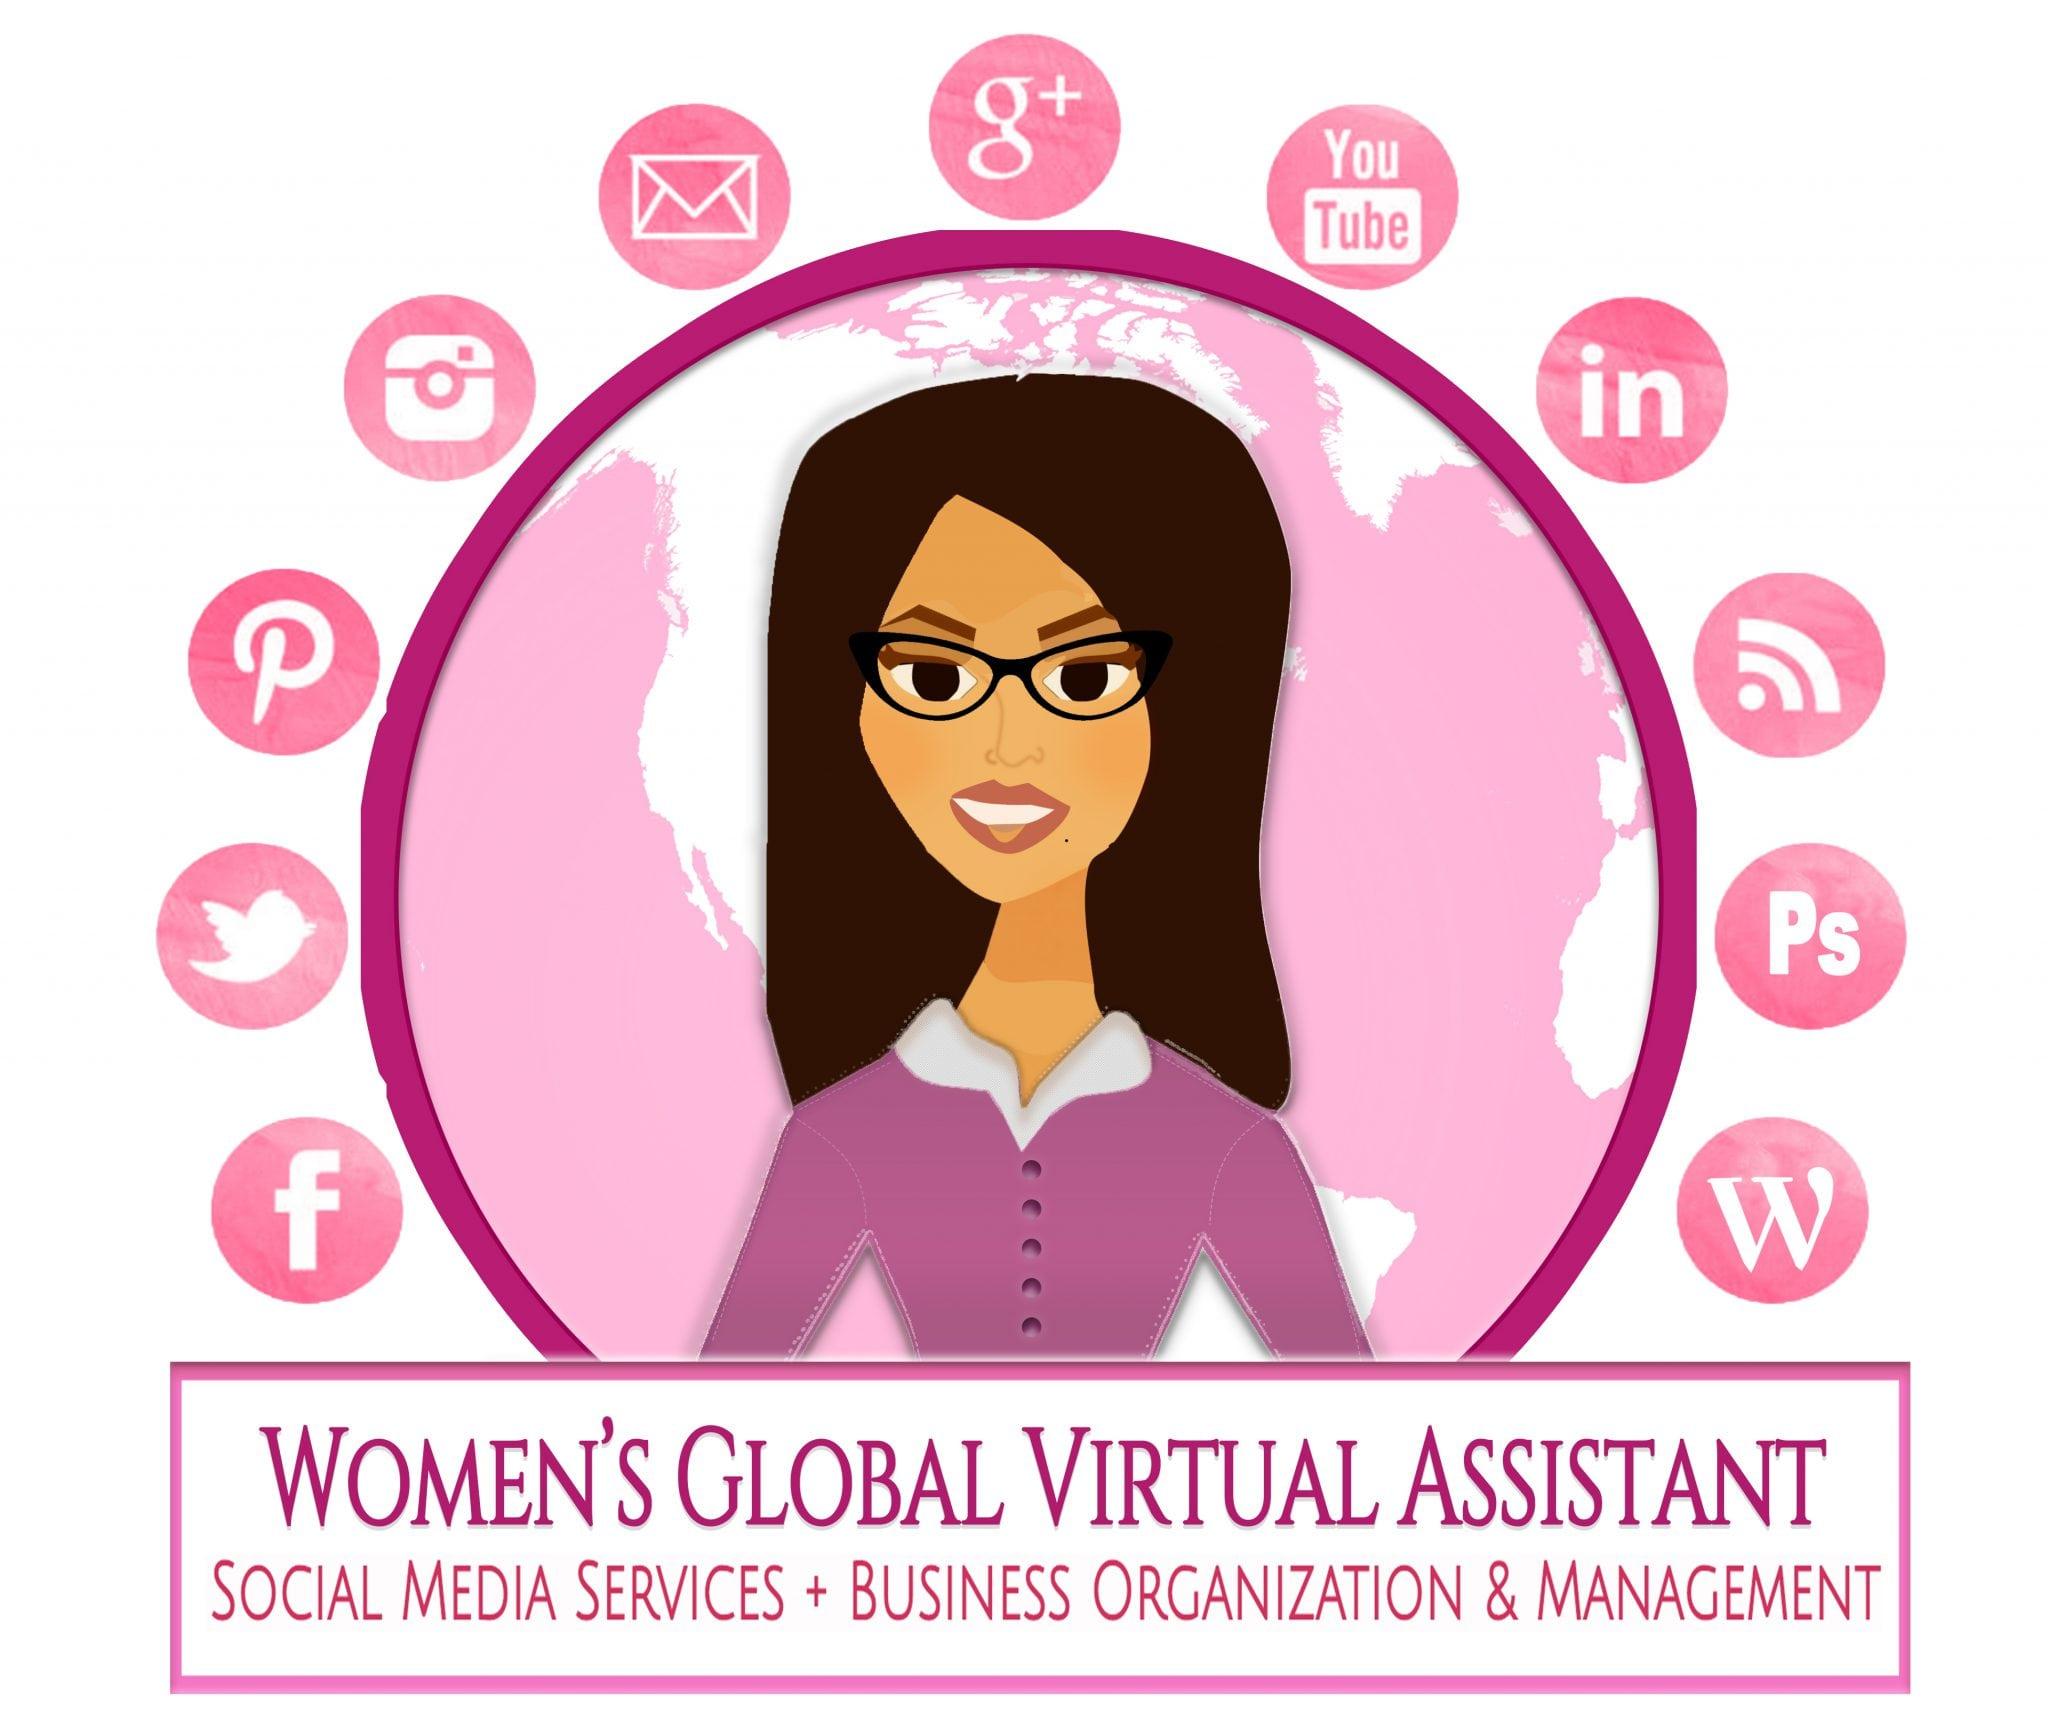 Women's Global Virtual Assistant Social Media Services+ Business Organization & Management